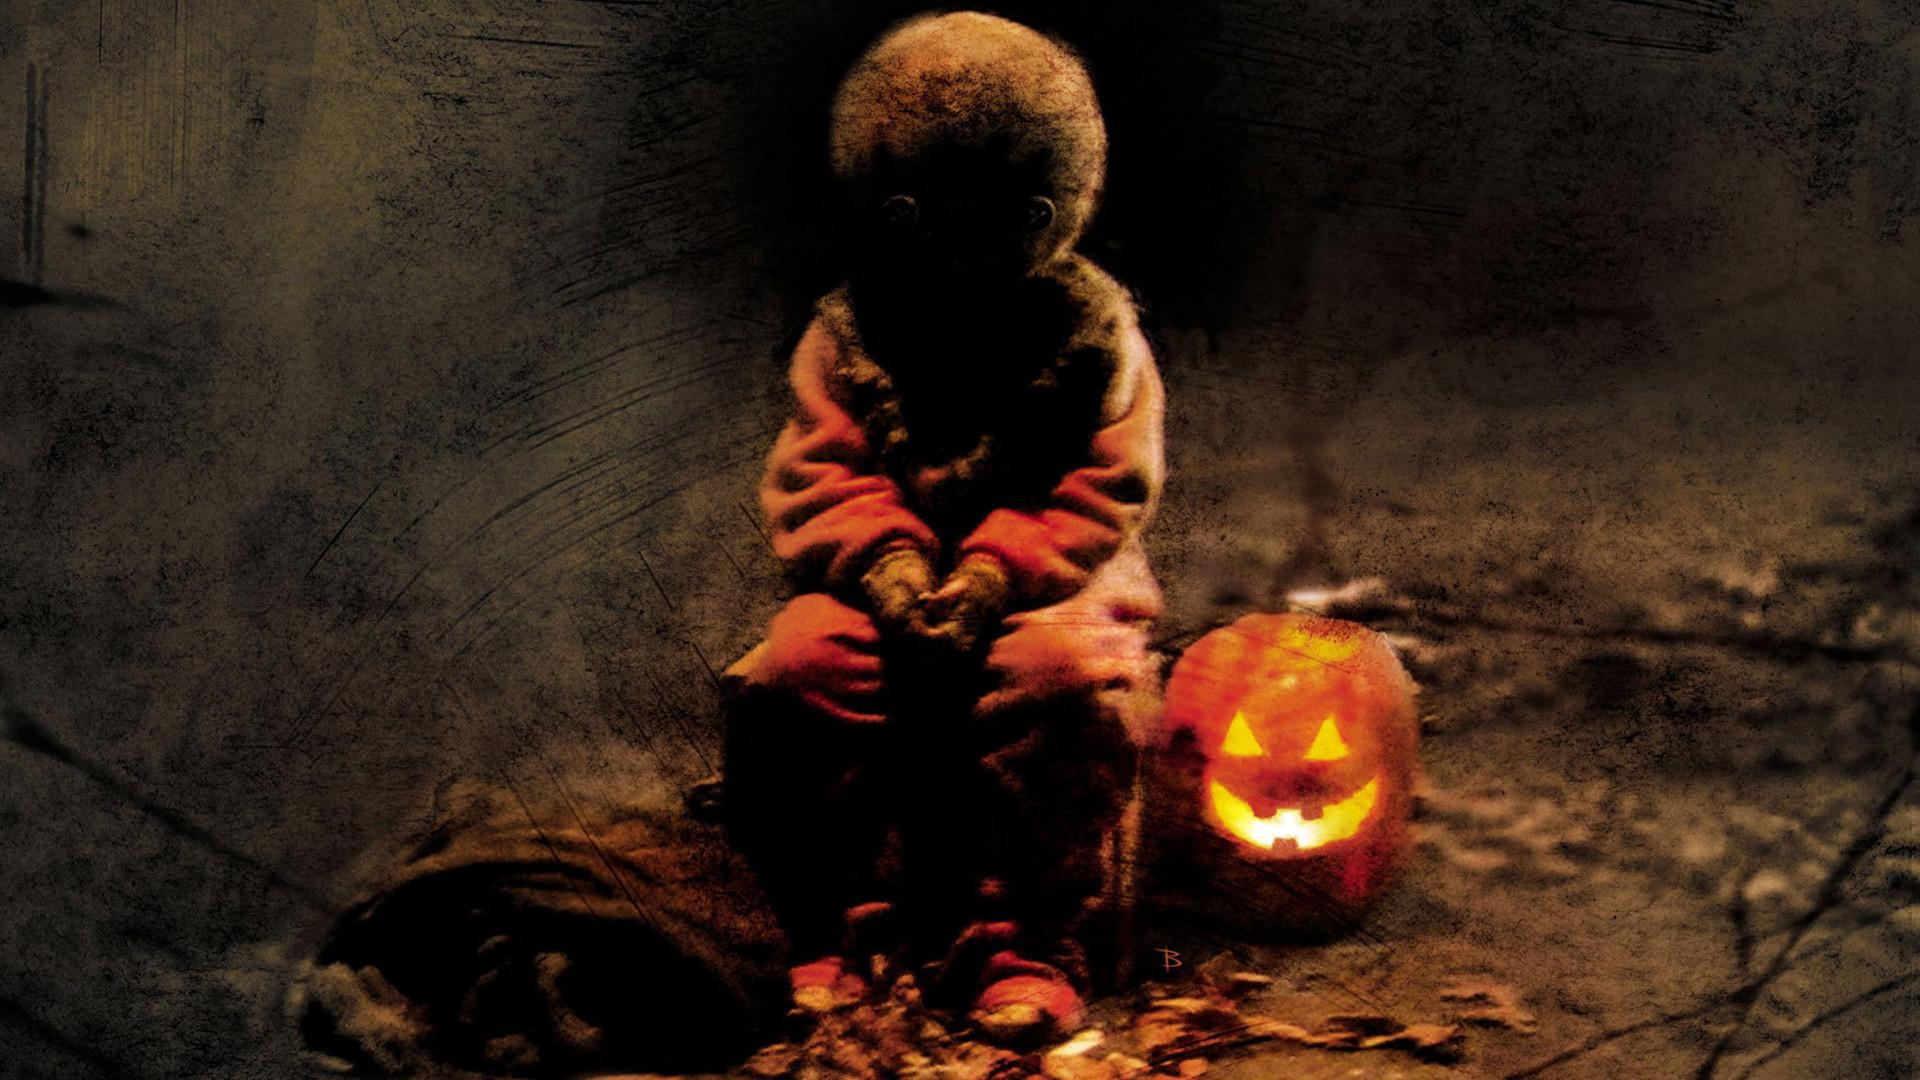 Creepy Movie Wallpapers | WallpapersIn4k.net. Creepy Movie Wallpapers  WallpapersIn4k Net. Halloween …